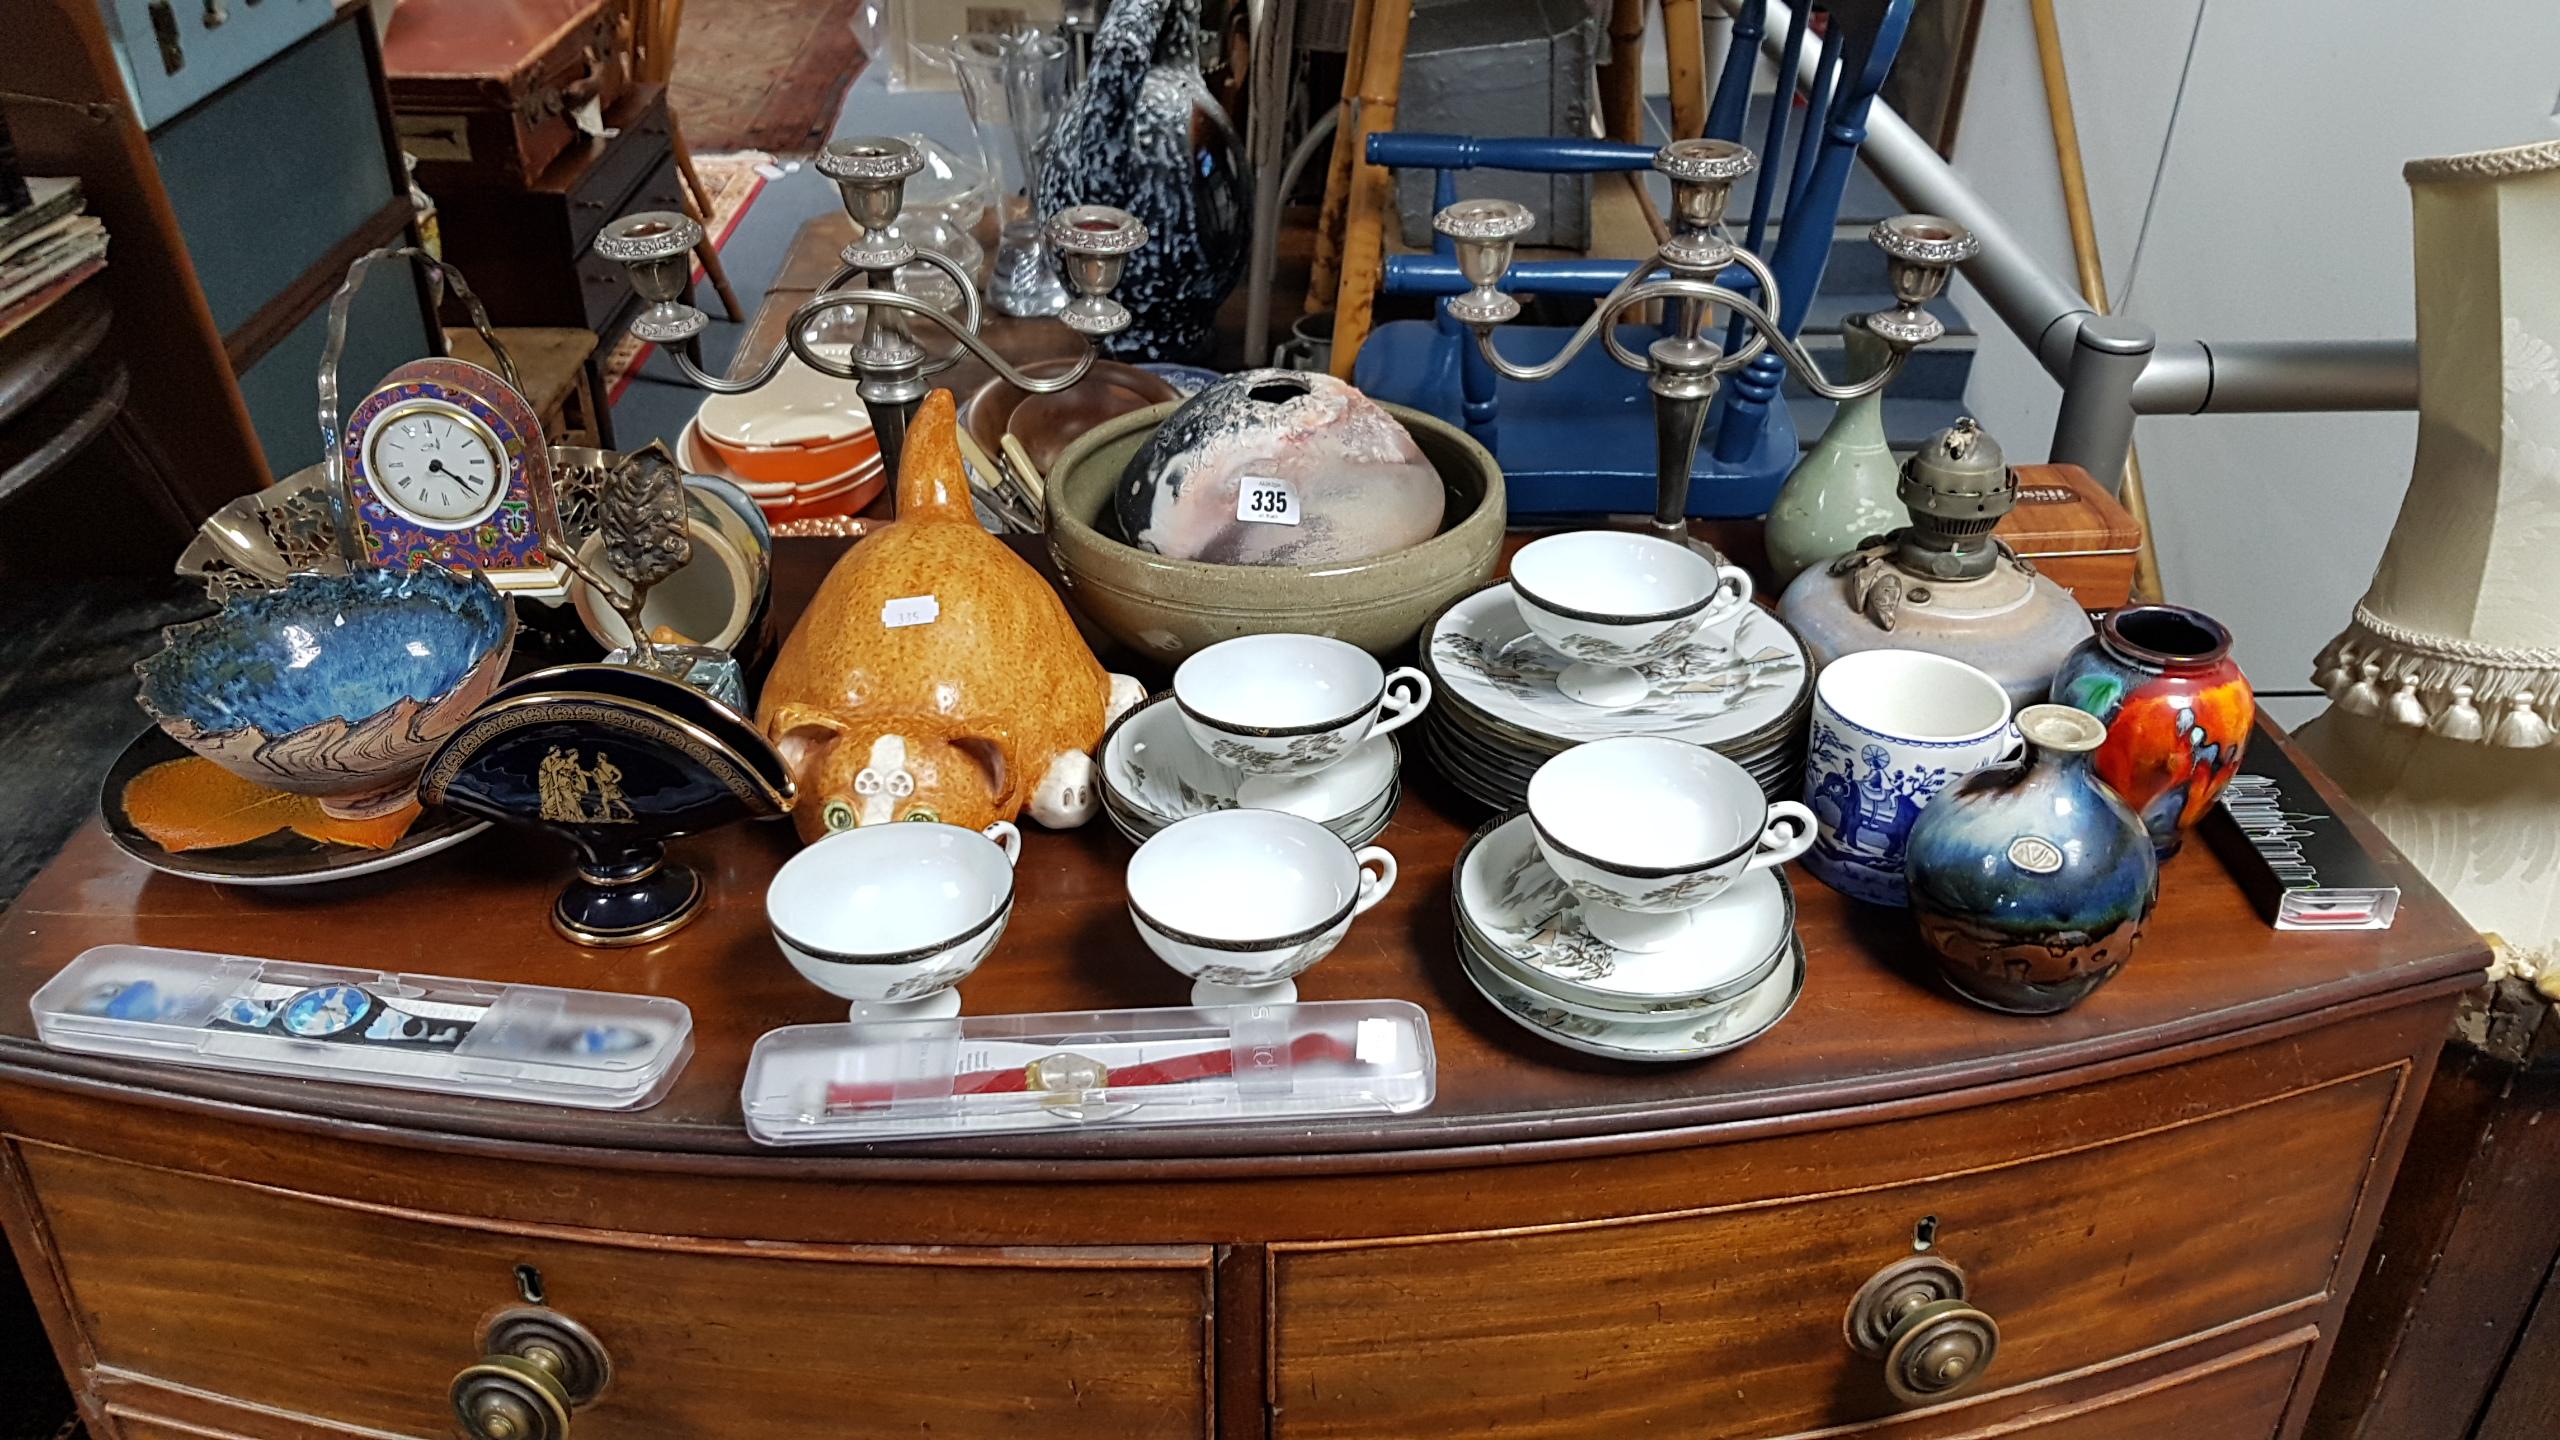 Lot 335 - A Japanese eggshell porcelain eighteen piece part tea service; various items of decorative china,